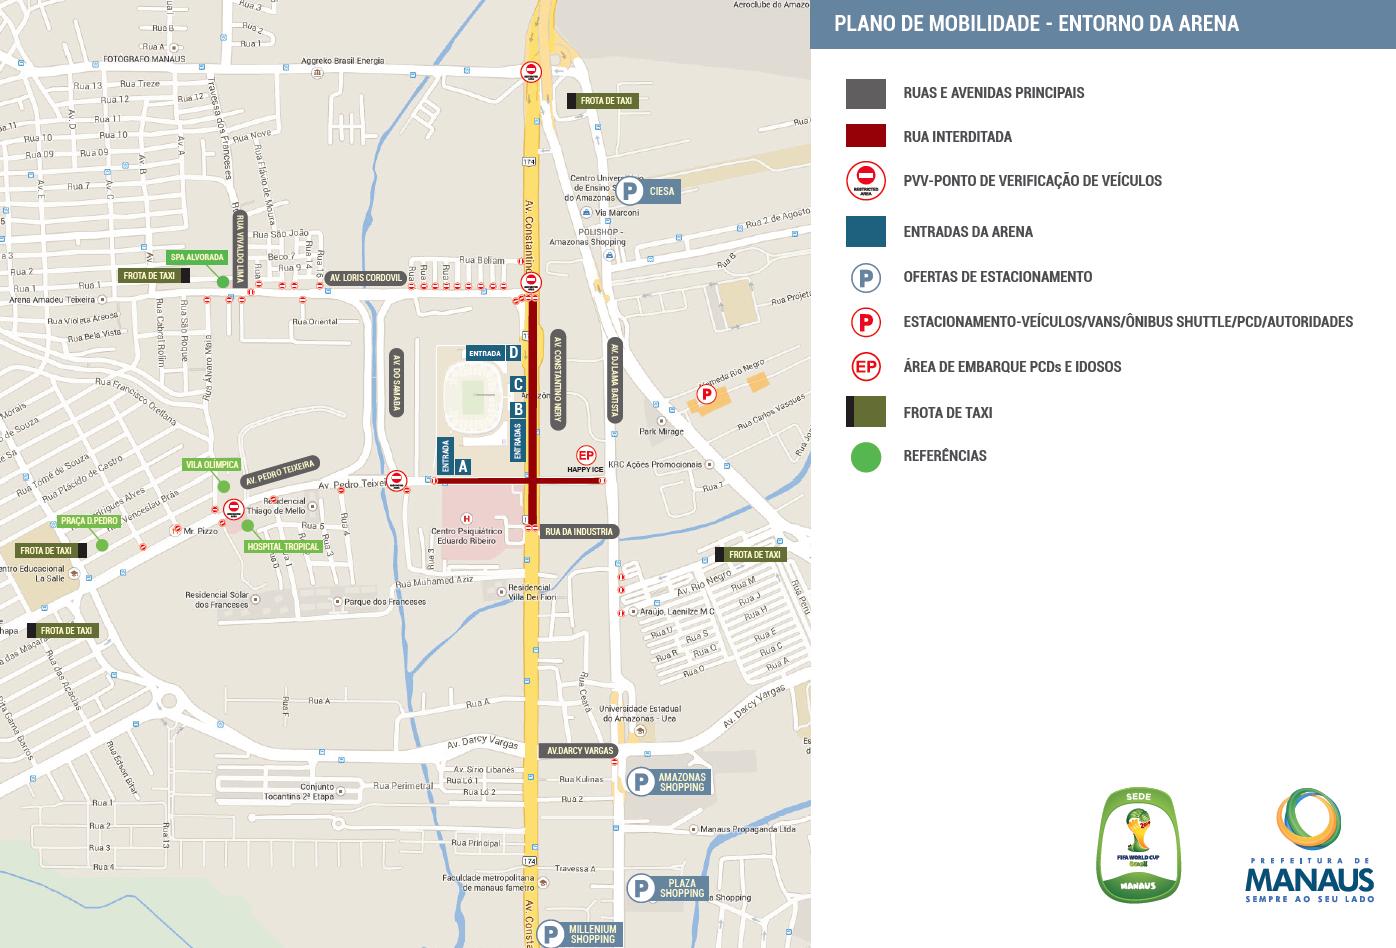 Manaus Mapa Movilidad - Brasil